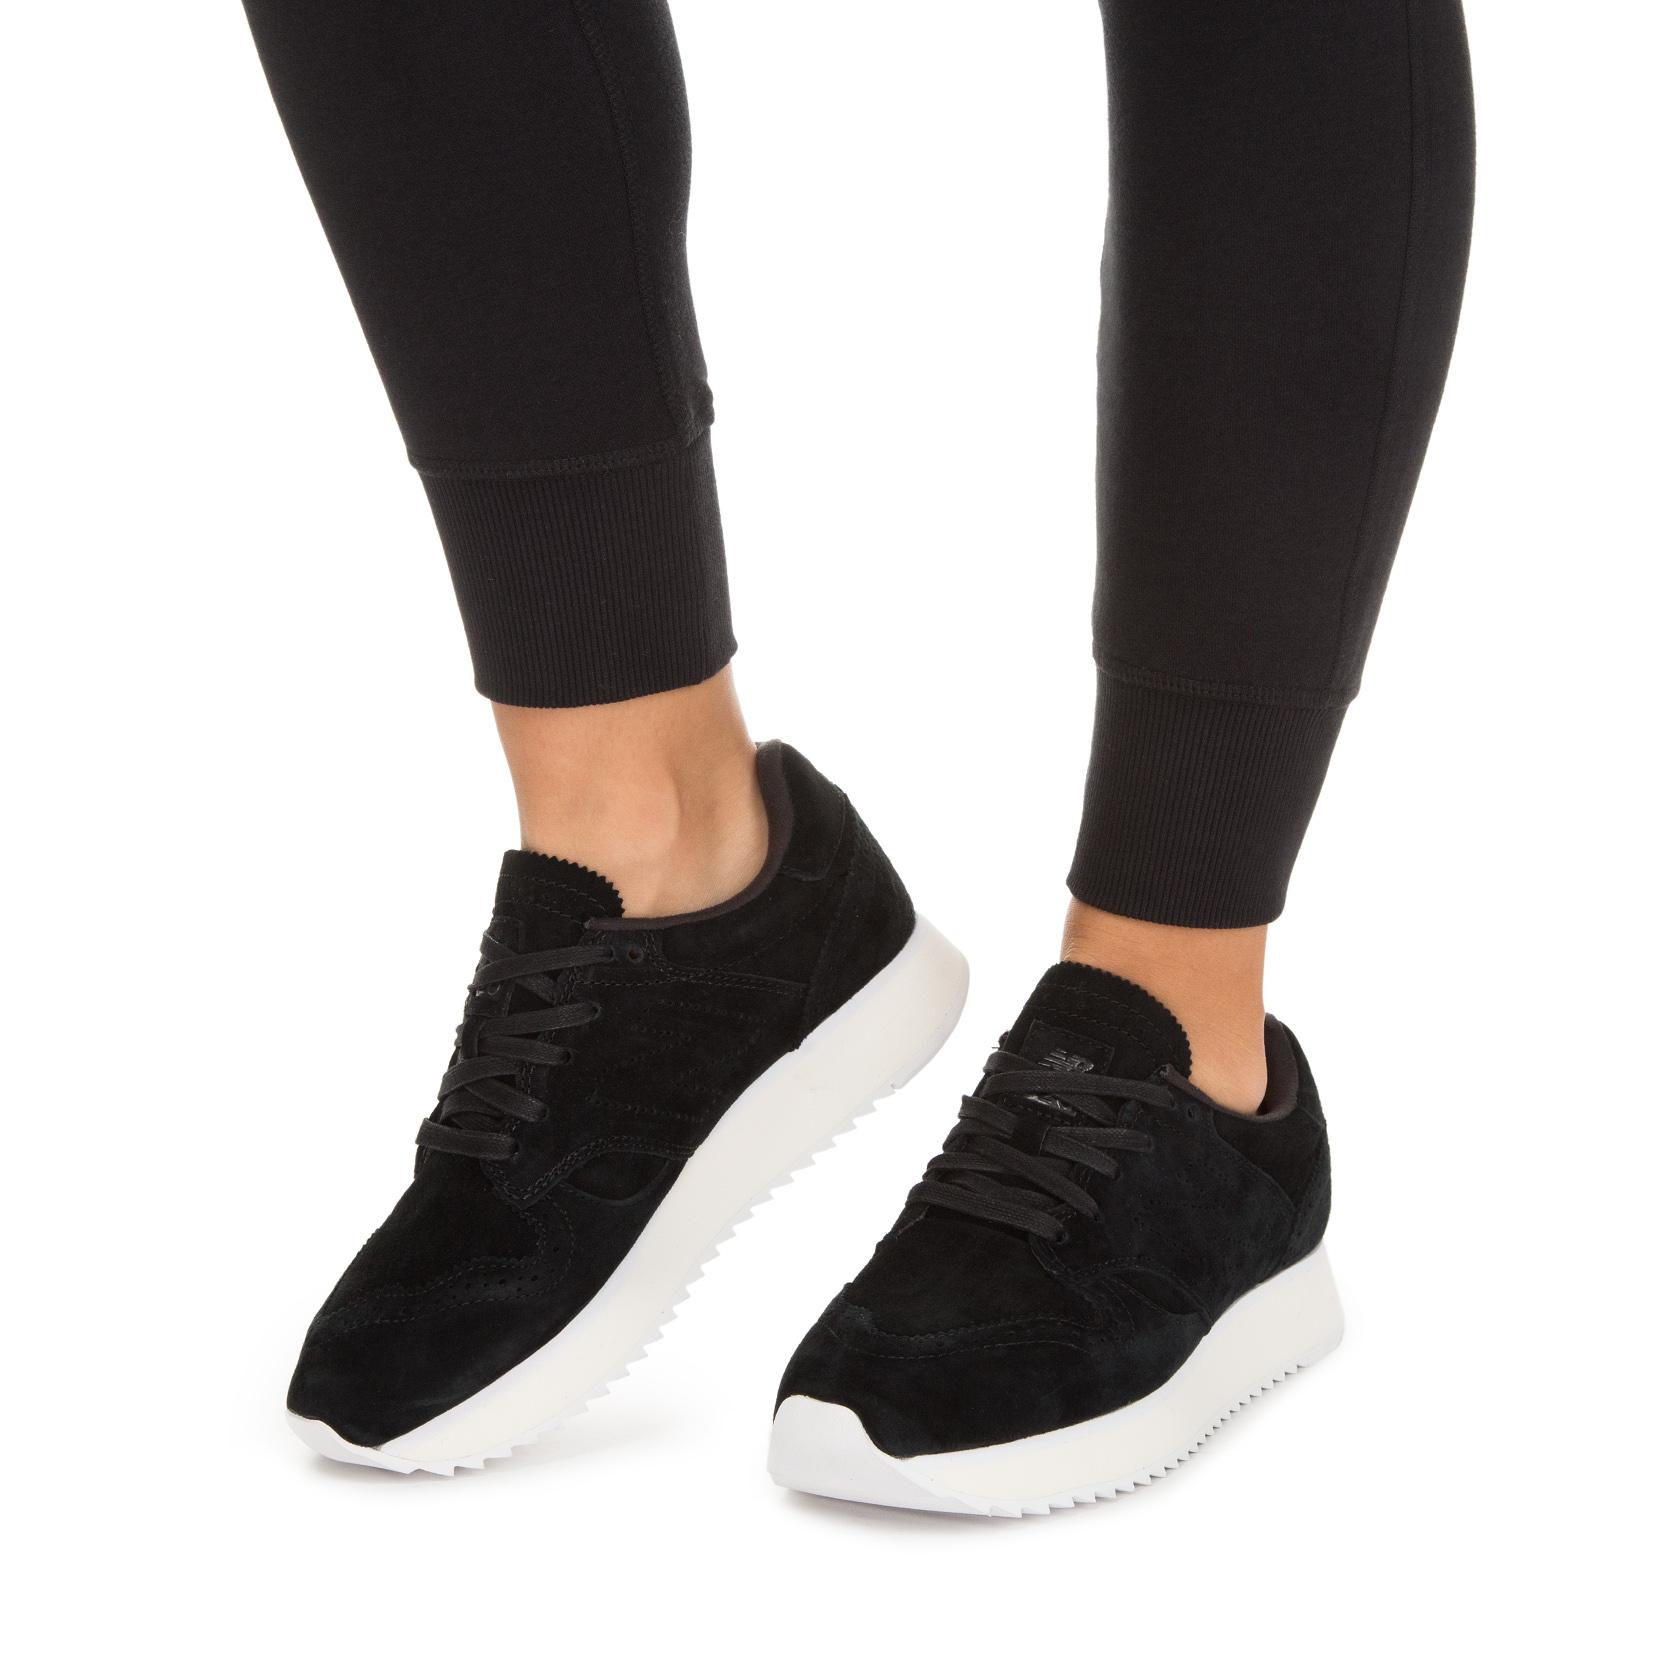 Жіноче взуття повсякденне New Balance 520 Platform WL520MA | New Balance